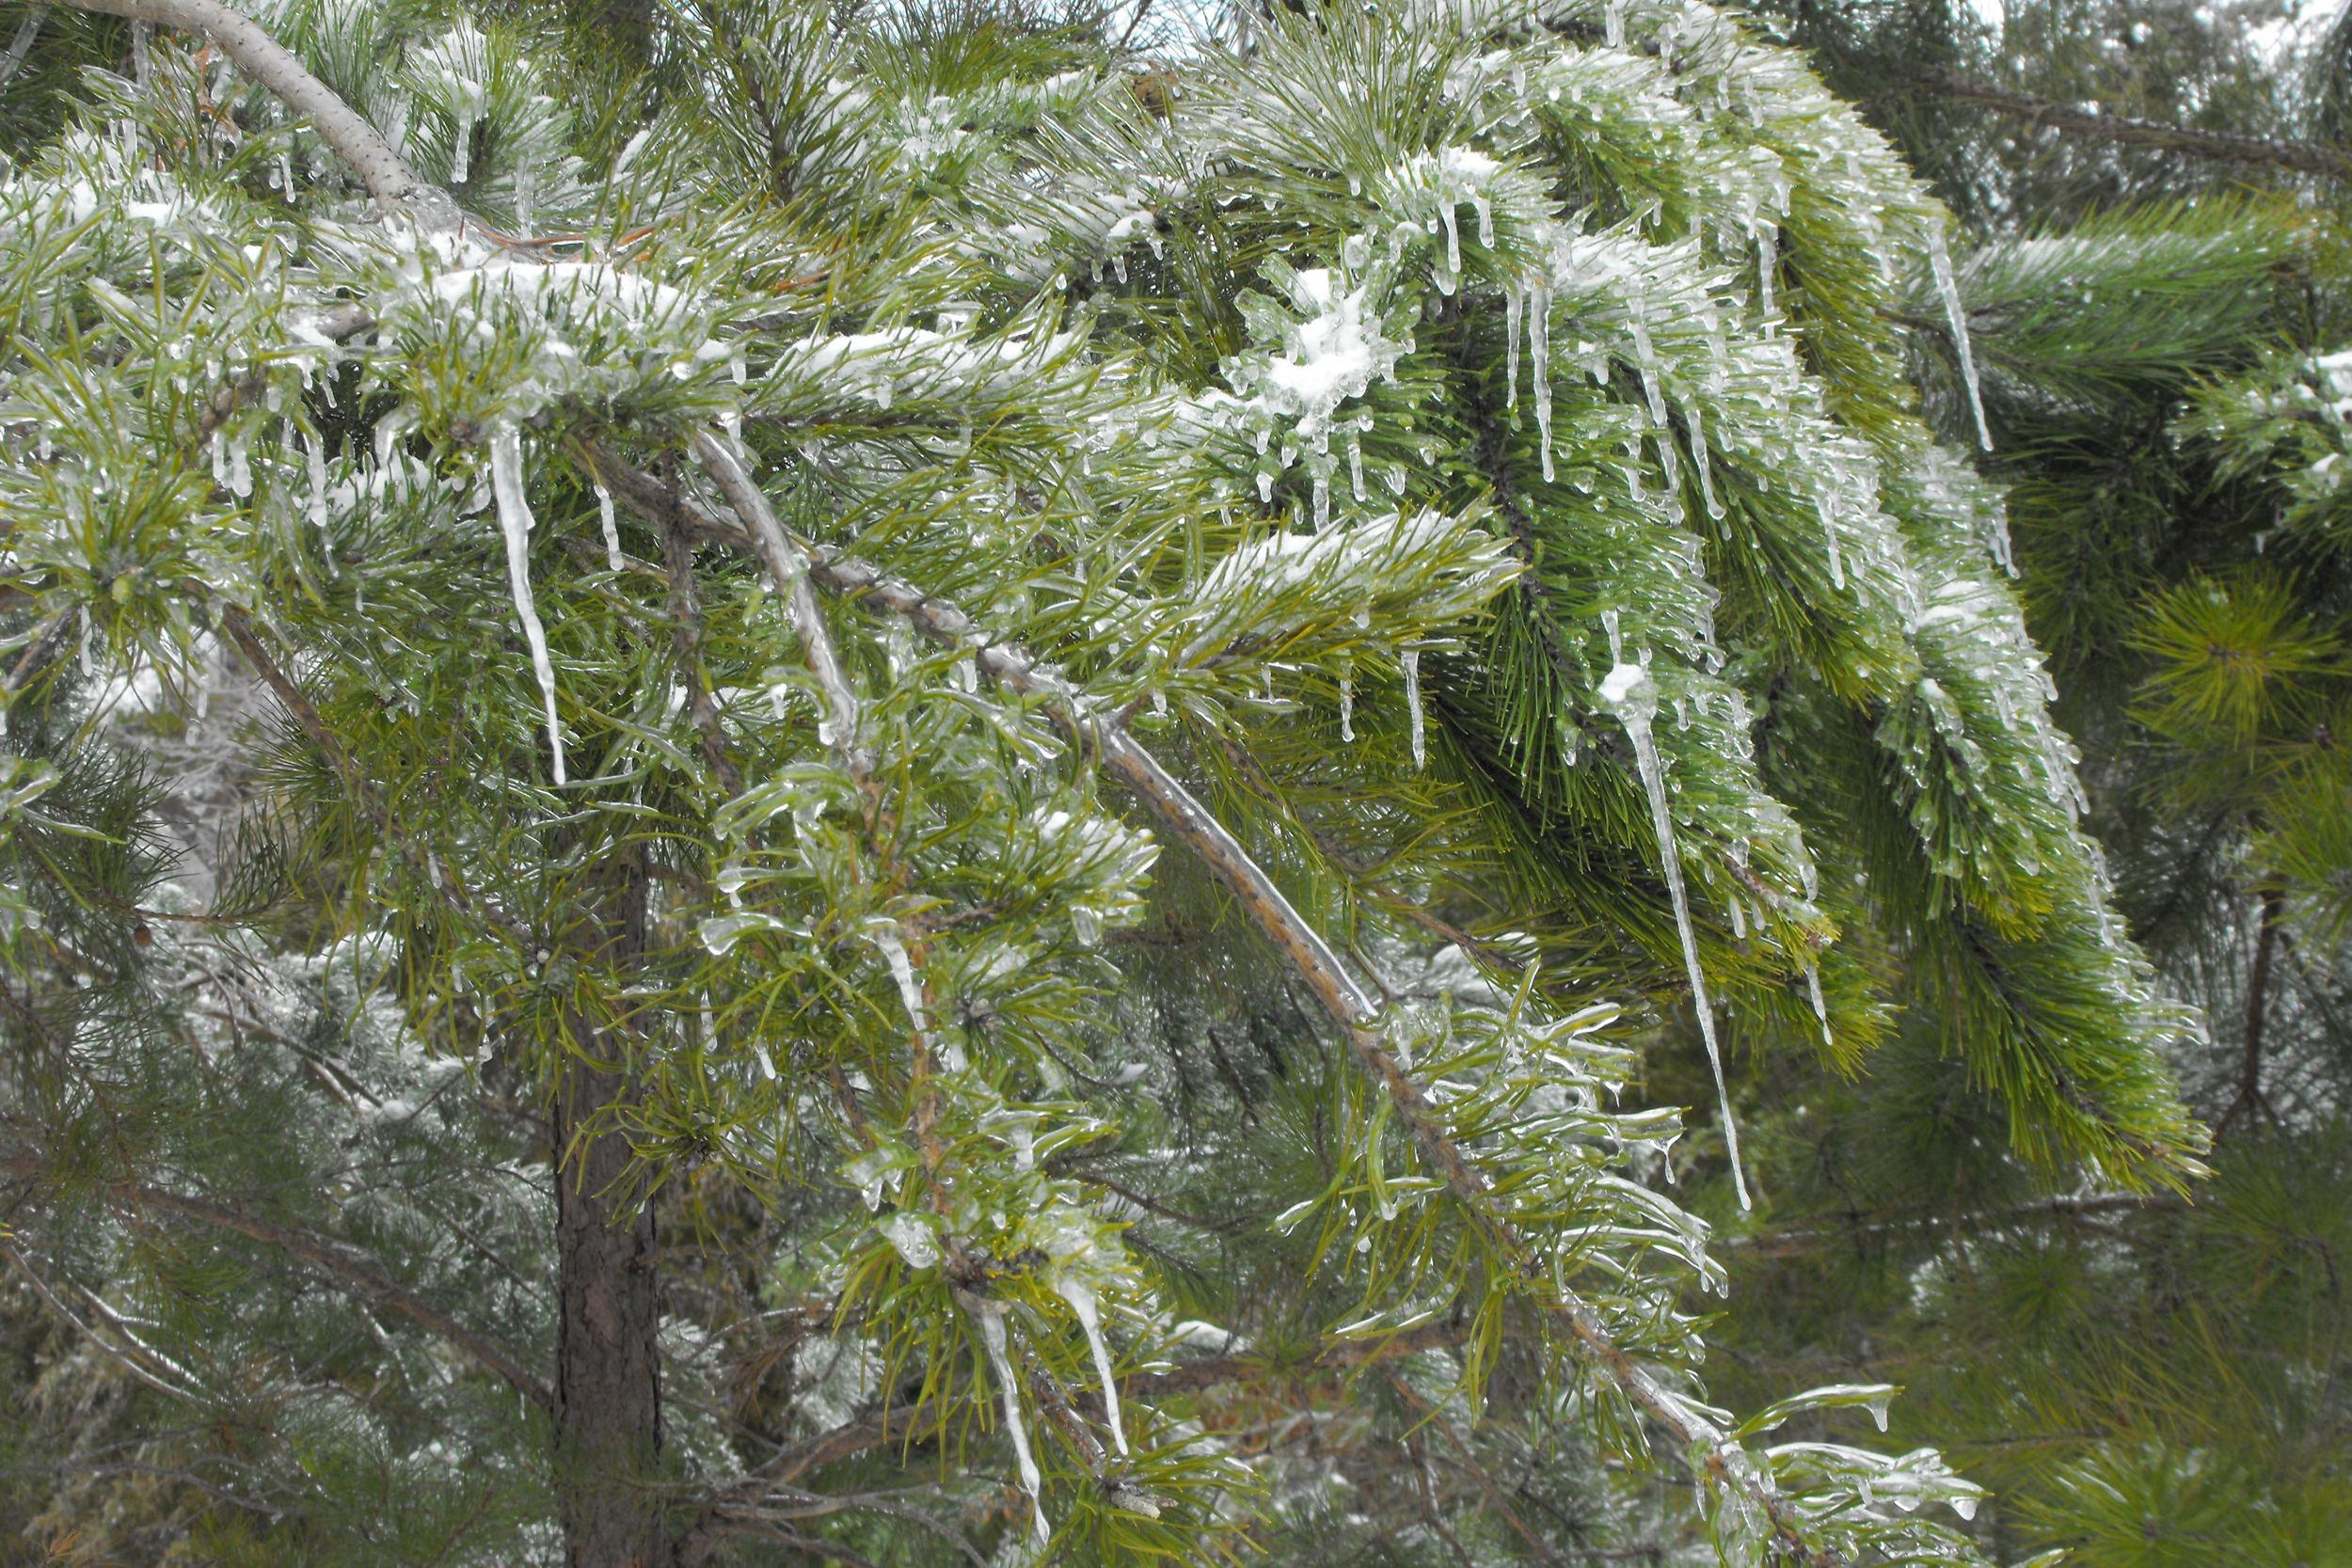 Icy greens3.jpg